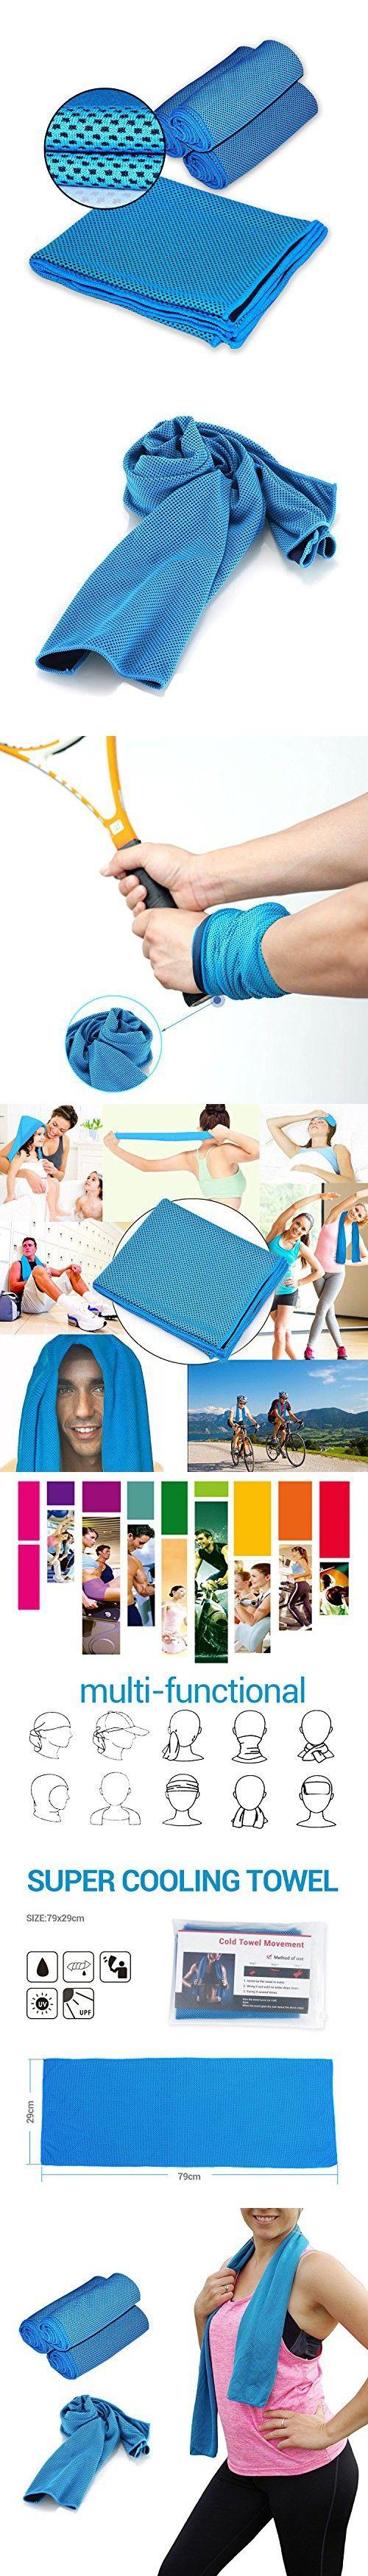 Sport Towels - Vitalismo Outdoor Golf Towels Gym Fast Drying Yoga Towels Super Absorbent Towel